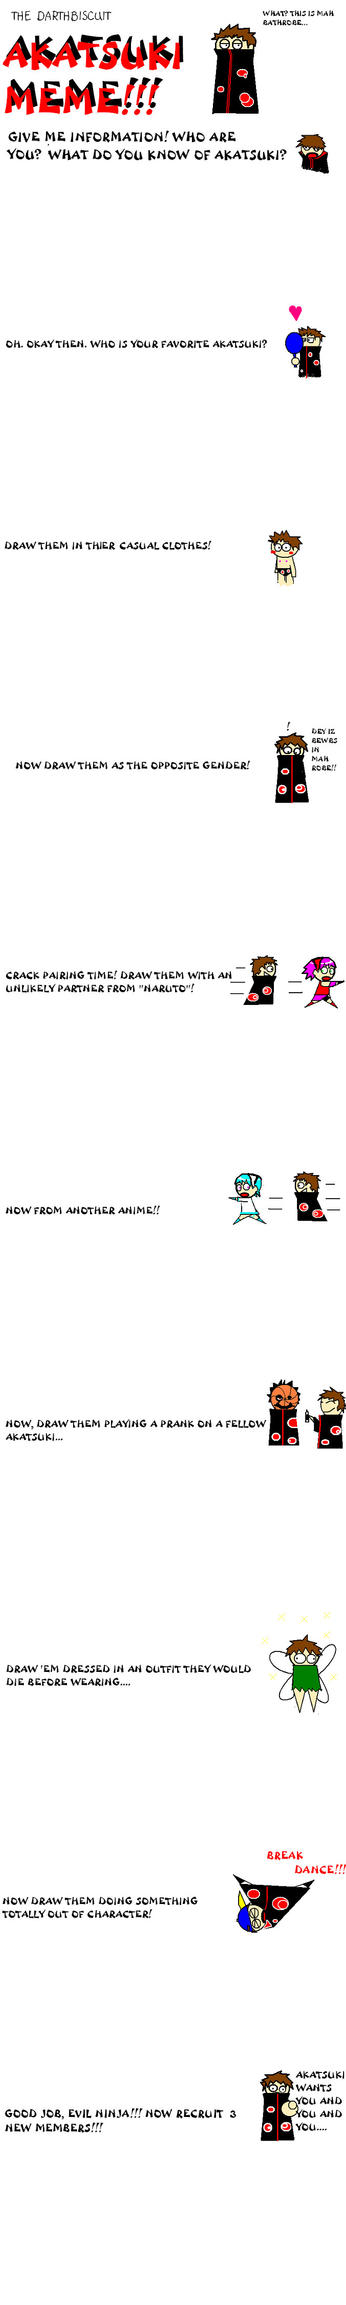 Akatsuki Meme by Darthbiscuit by darthbiscuit80